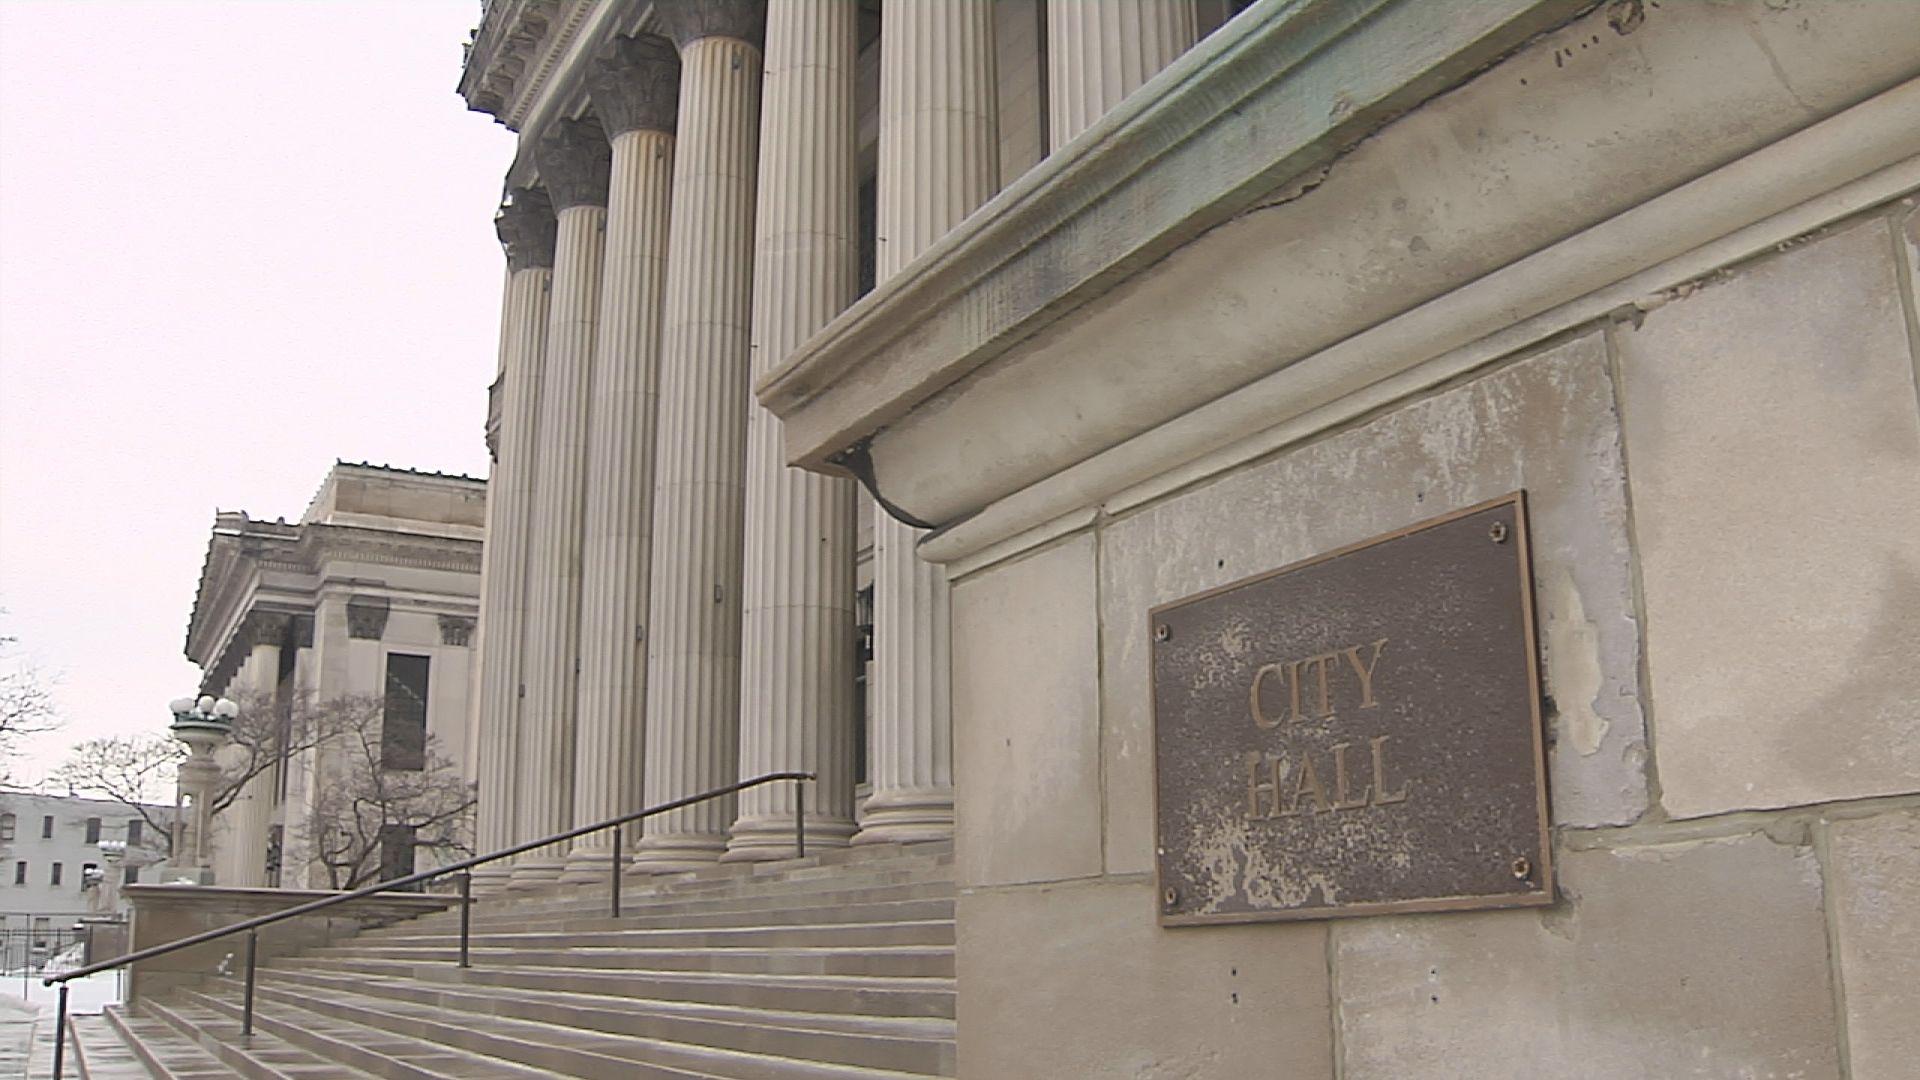 springfield city hall.jpg